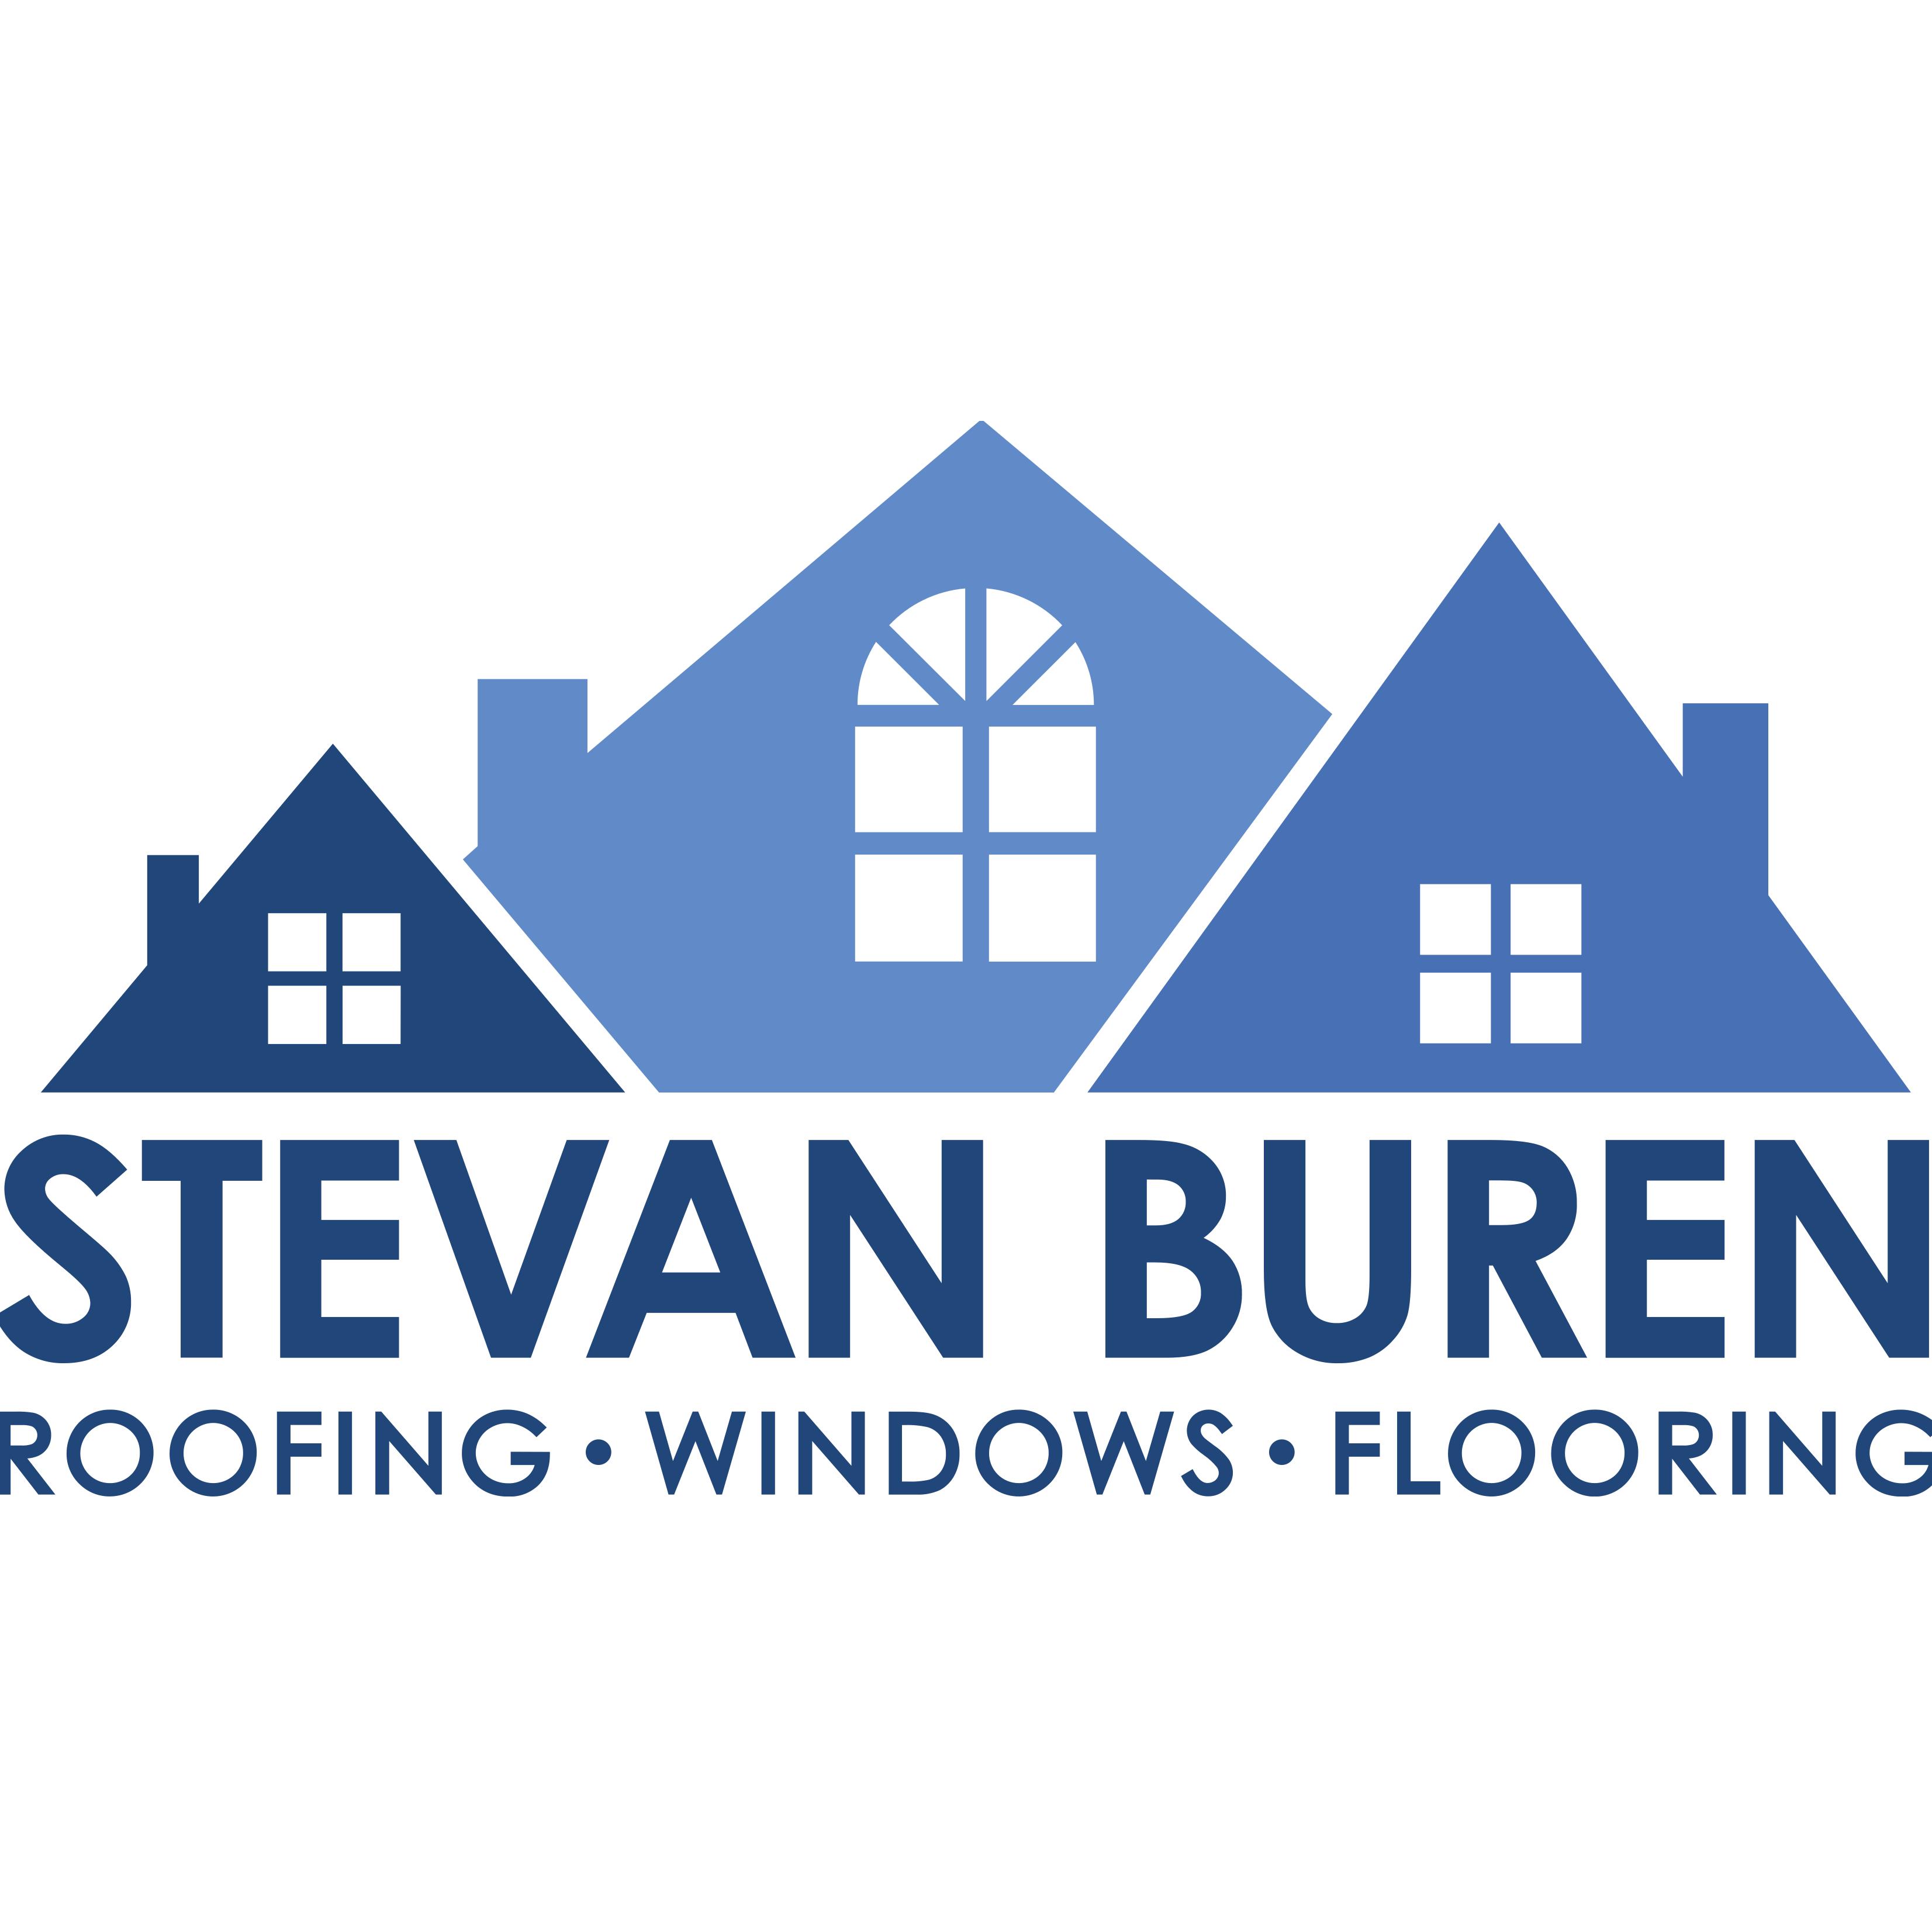 Stevan Buren Roofing, Windows, and Flooring image 4